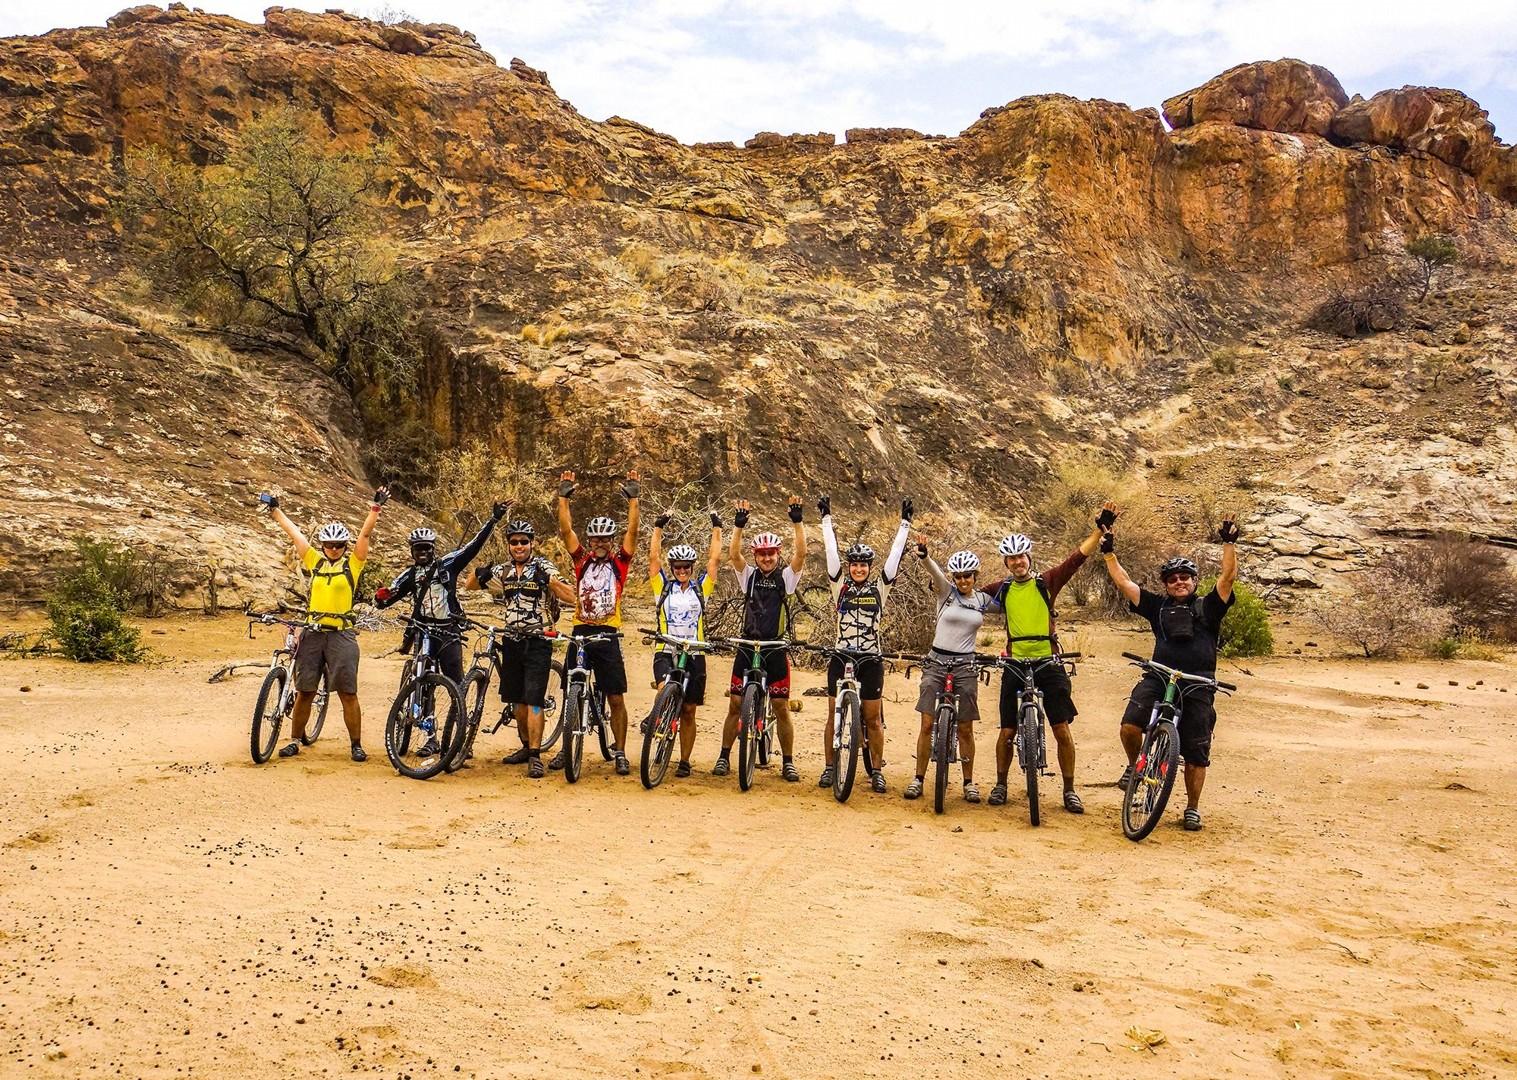 group-mountain-bike-ride-through-south-africa-botswana-skedaddle-holiday.jpg - NEW! South Africa and Botswana - Mountain Biking